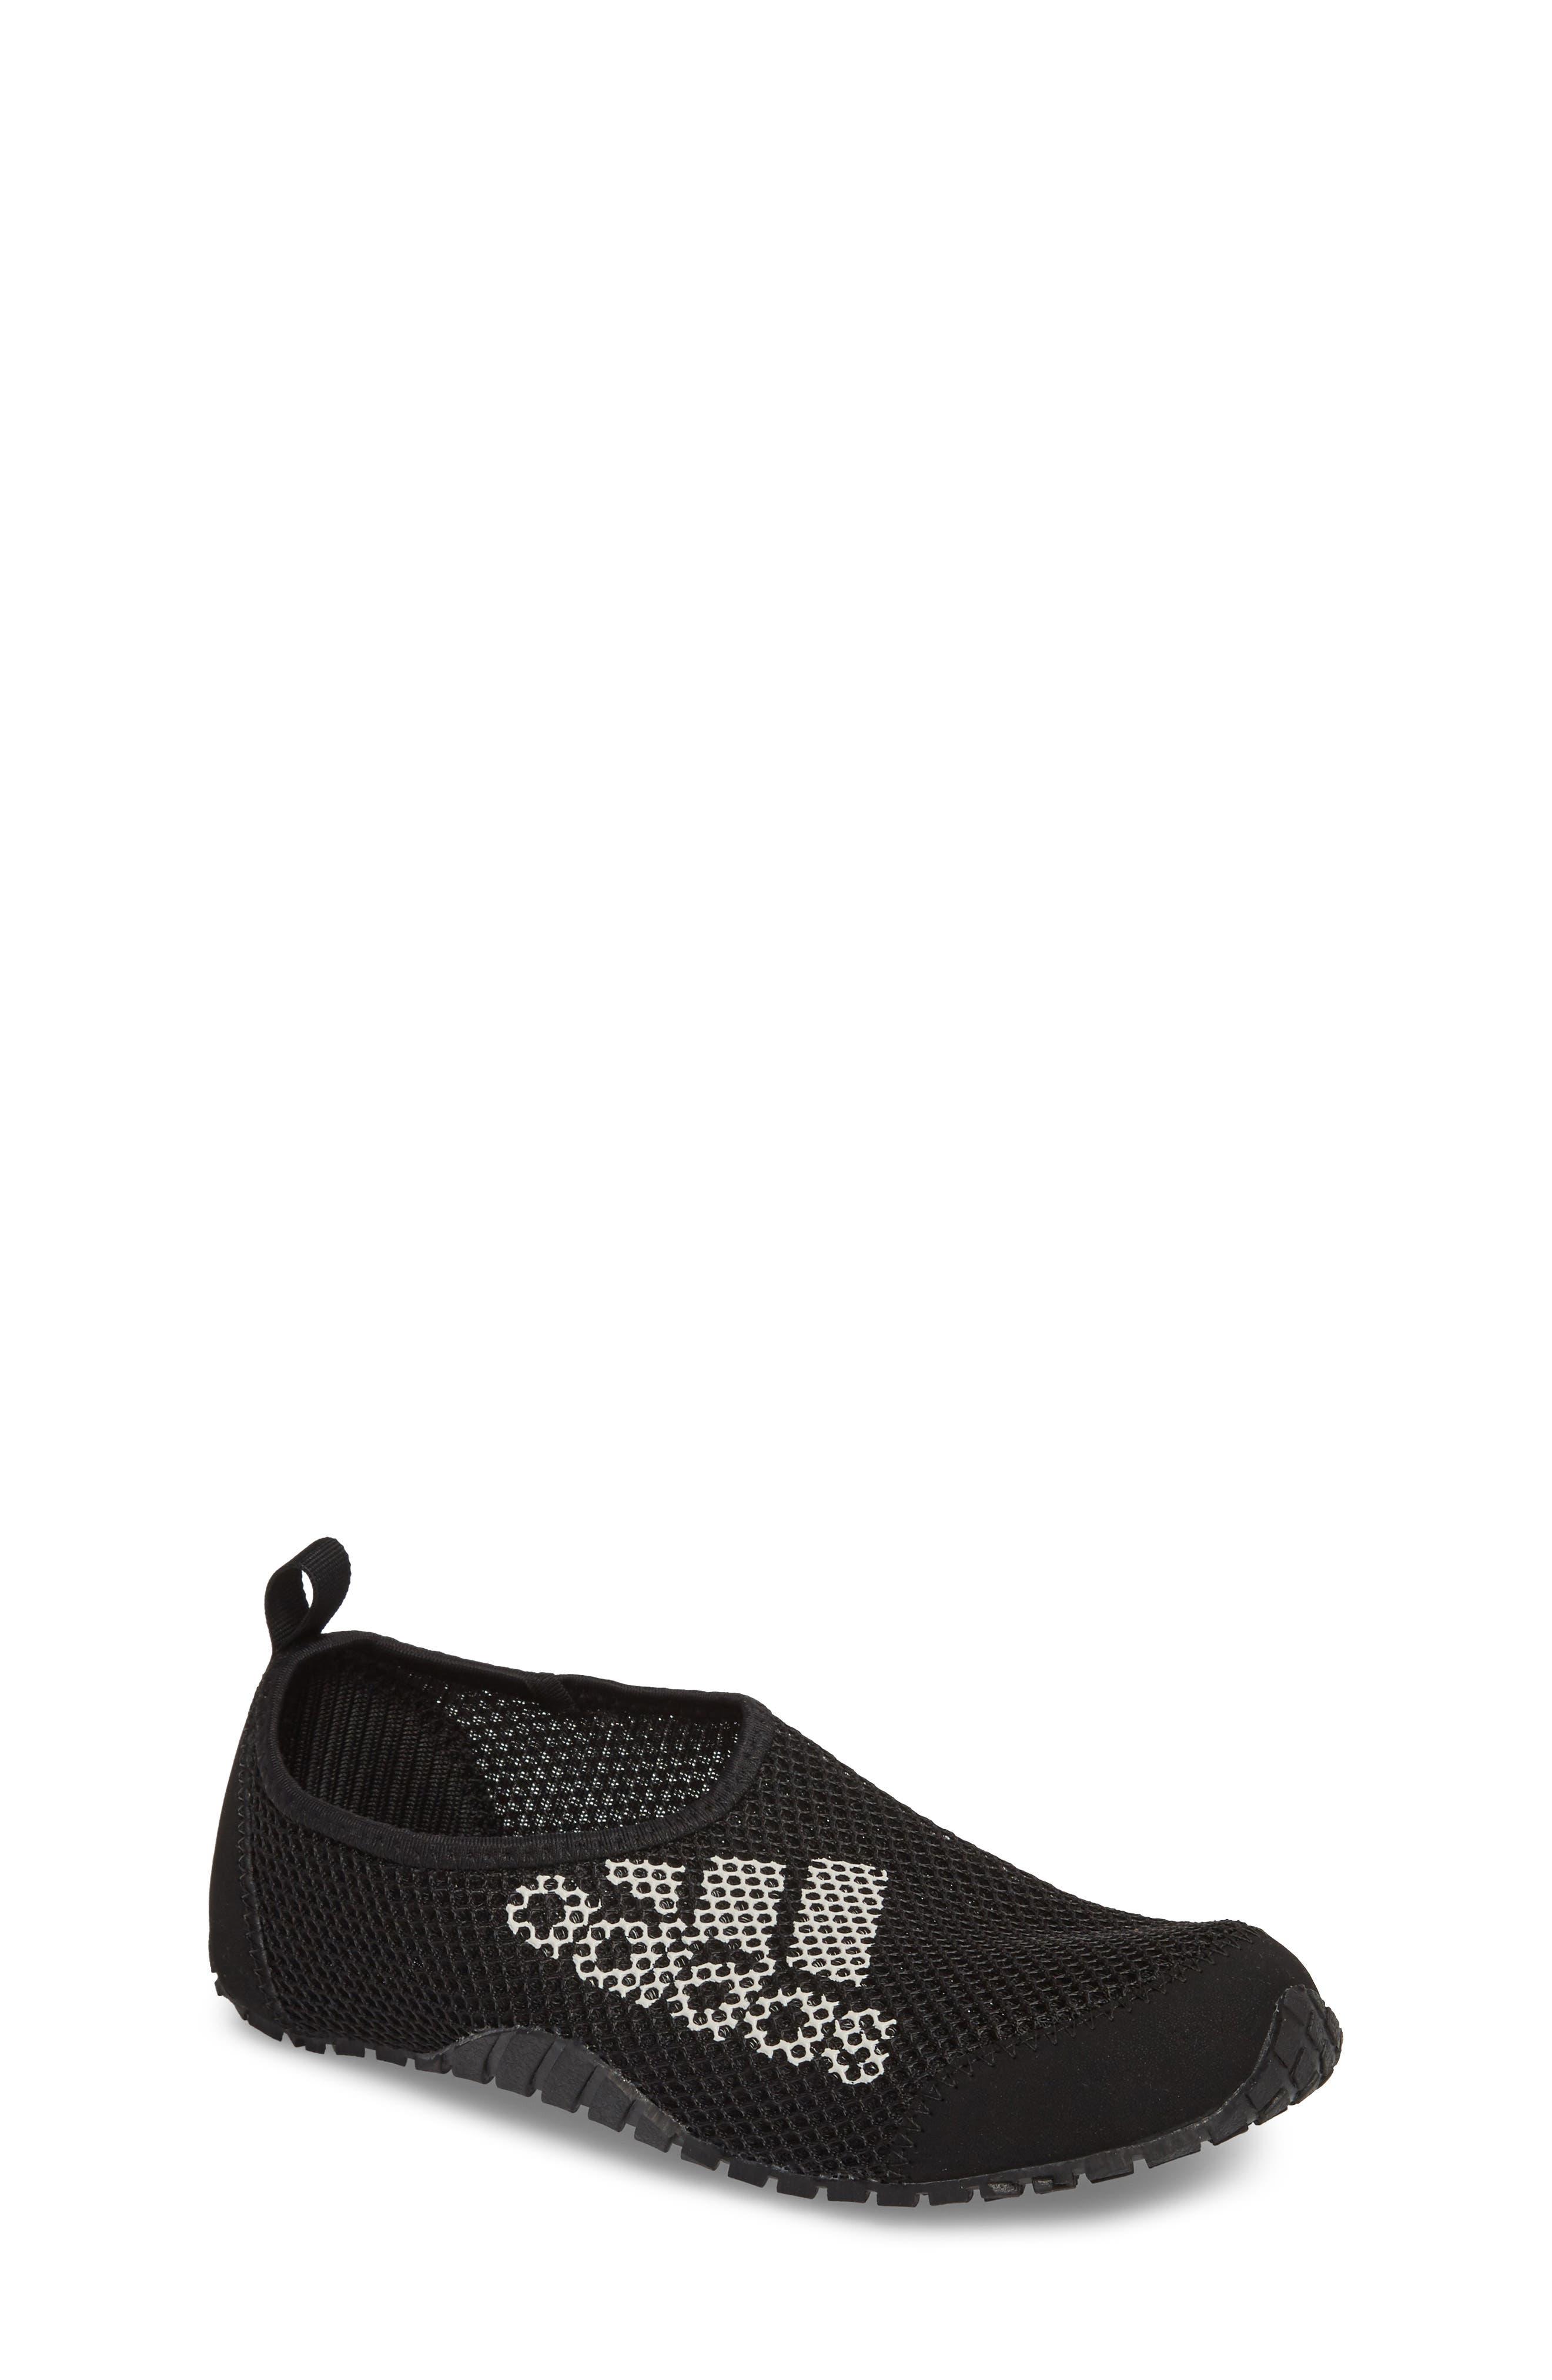 Kurobe Mesh Slip-On Water Shoe,                             Main thumbnail 1, color,                             BLACK/ BLACK GREY ONE